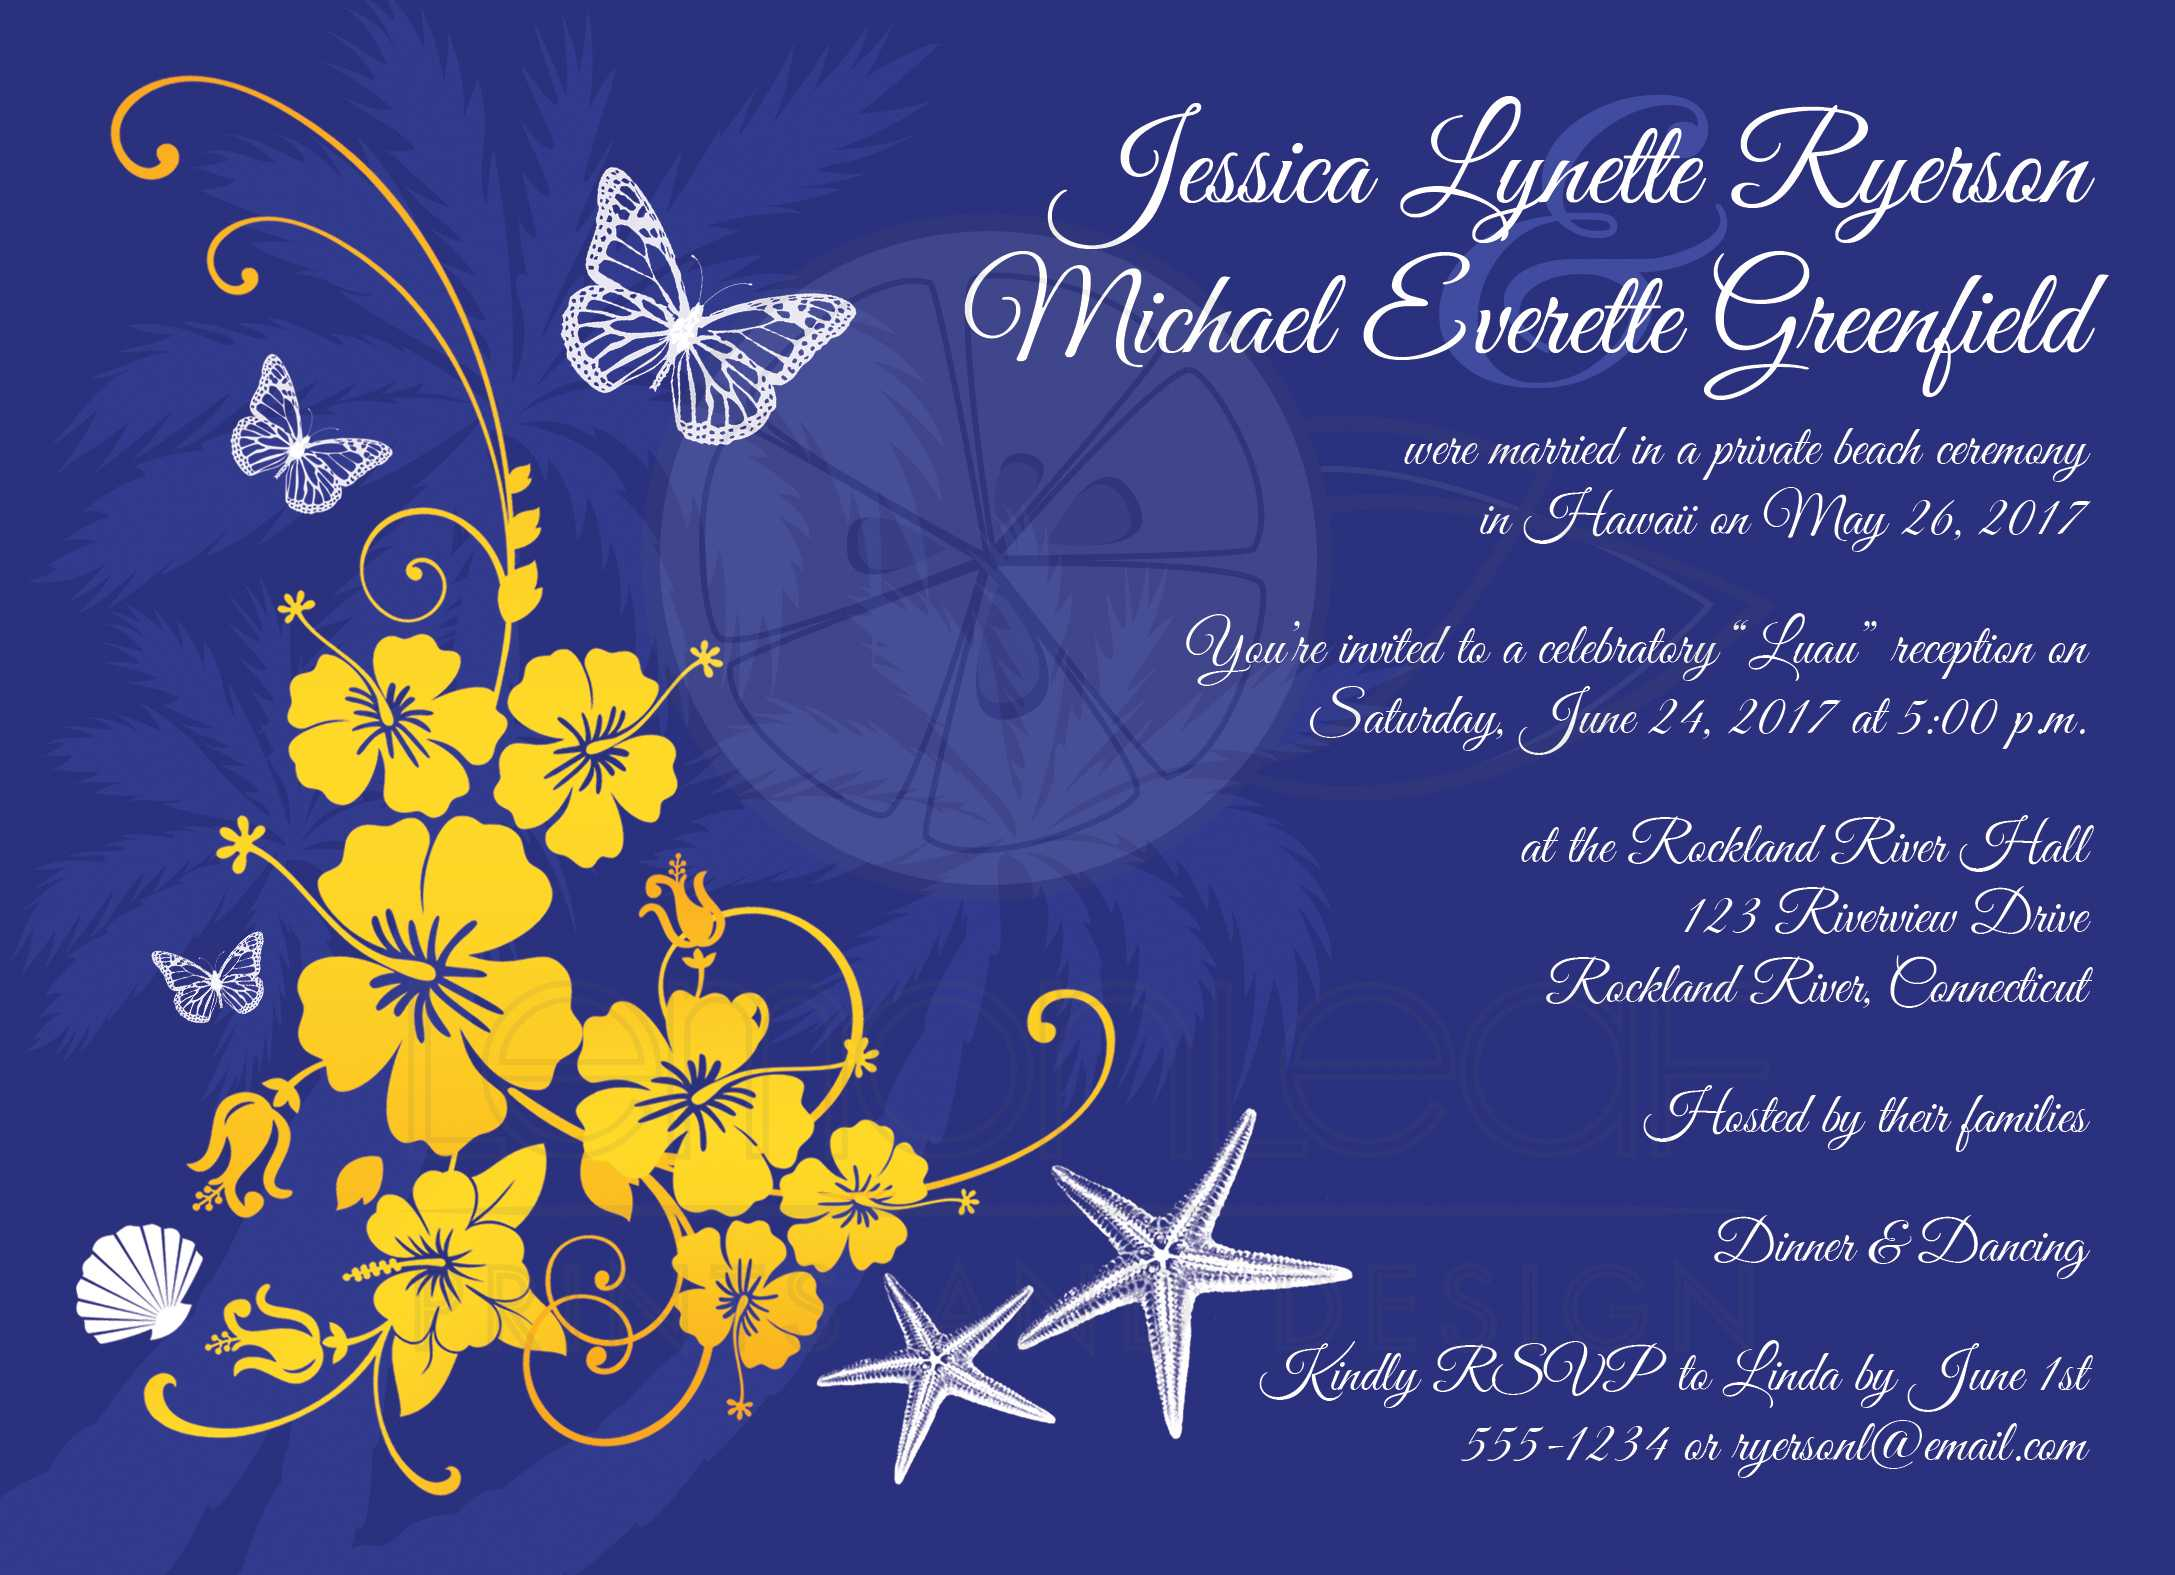 Post Wedding Reception Invitation | Blue, Yellow, White Tropical ...